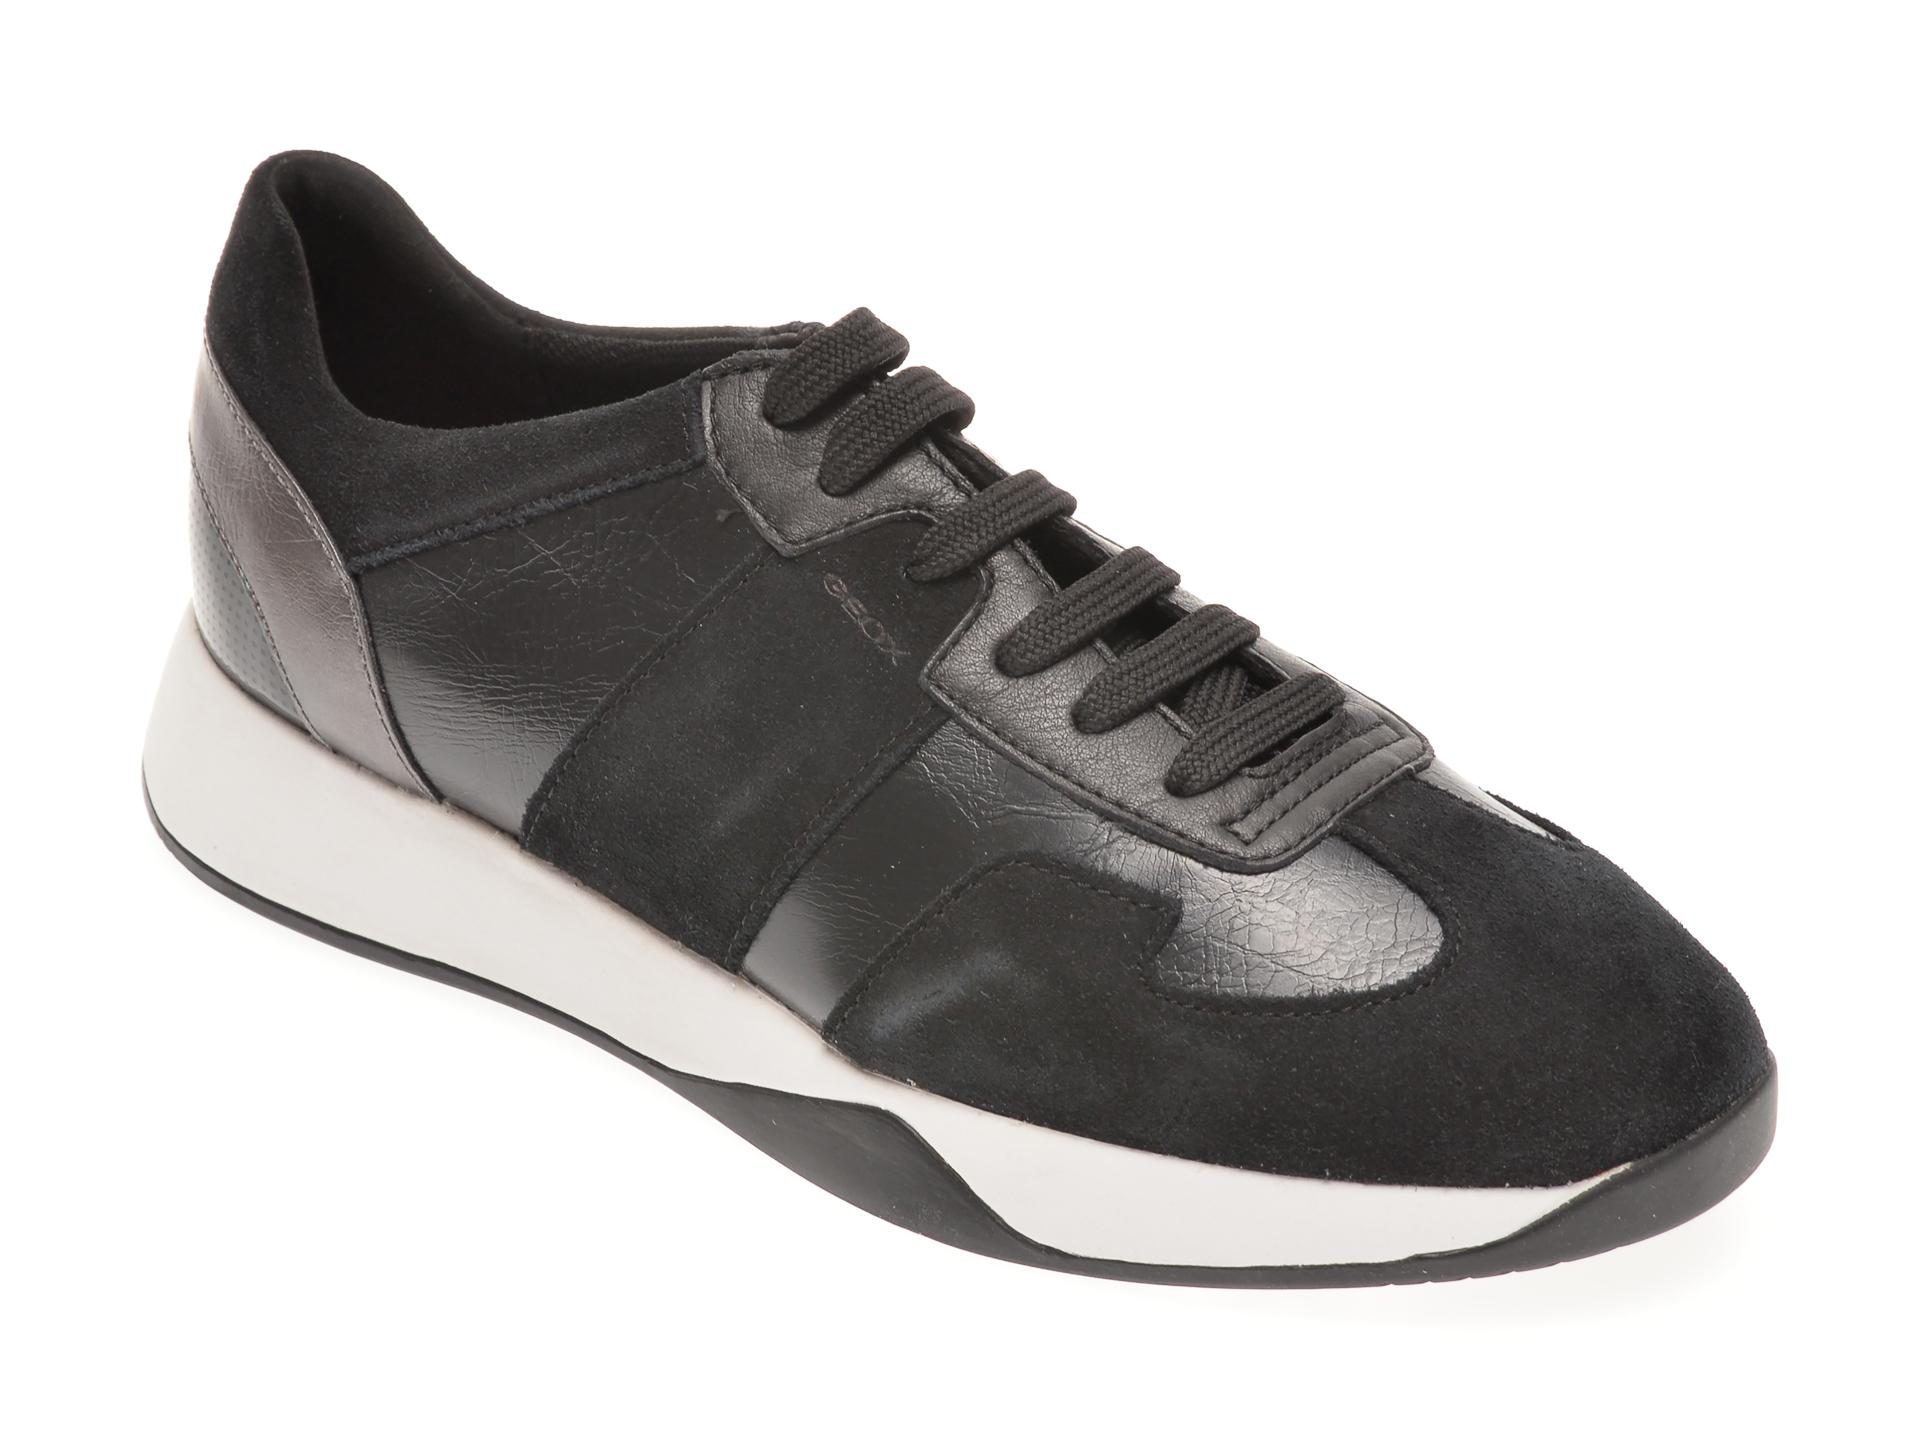 Pantofi Sport Geox Negri, D94frb, Din Piele Naturala